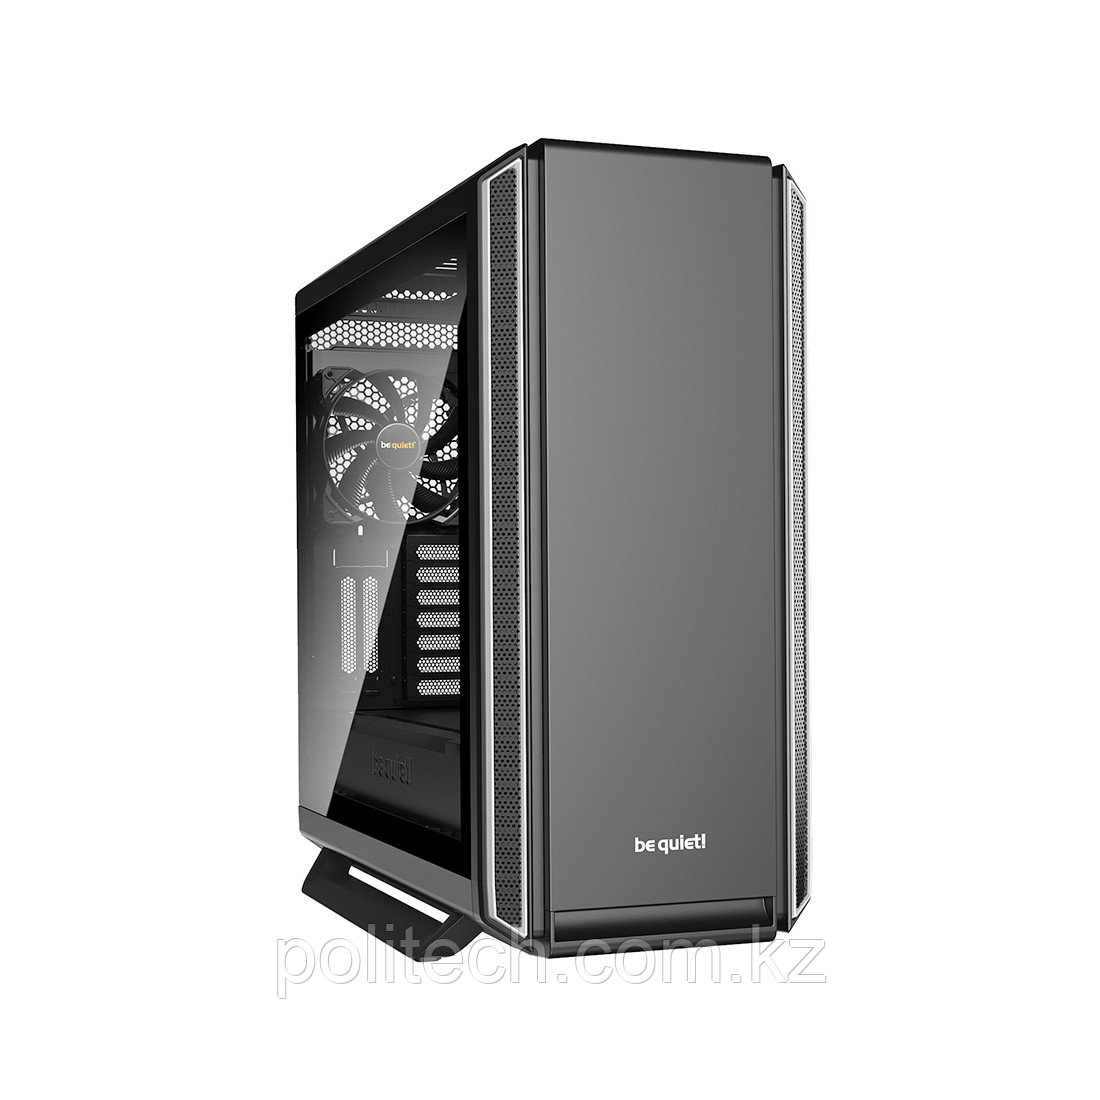 Компьютерный корпус Bequiet! Silent Base 801 Window Silver